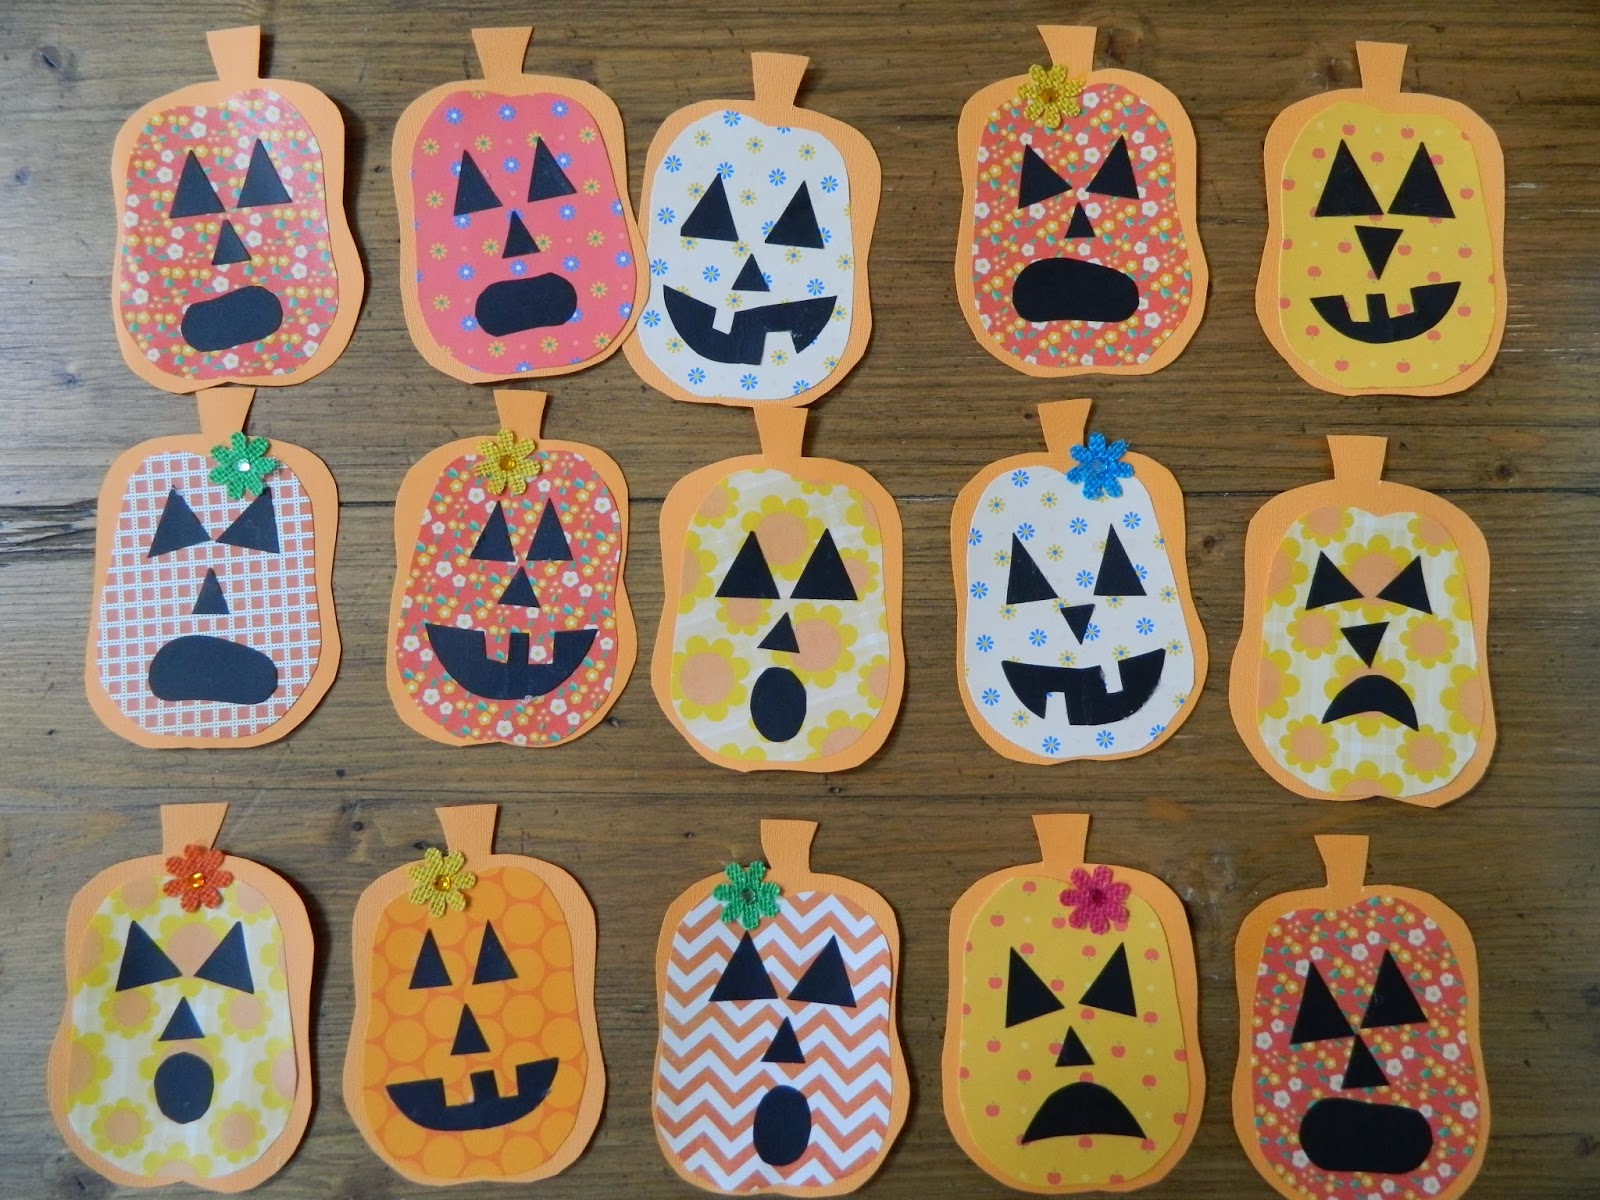 Decorating Ideas > The Vintage Umbrella October 2013 ~ 202211_Halloween Decoration Ideas Preschool